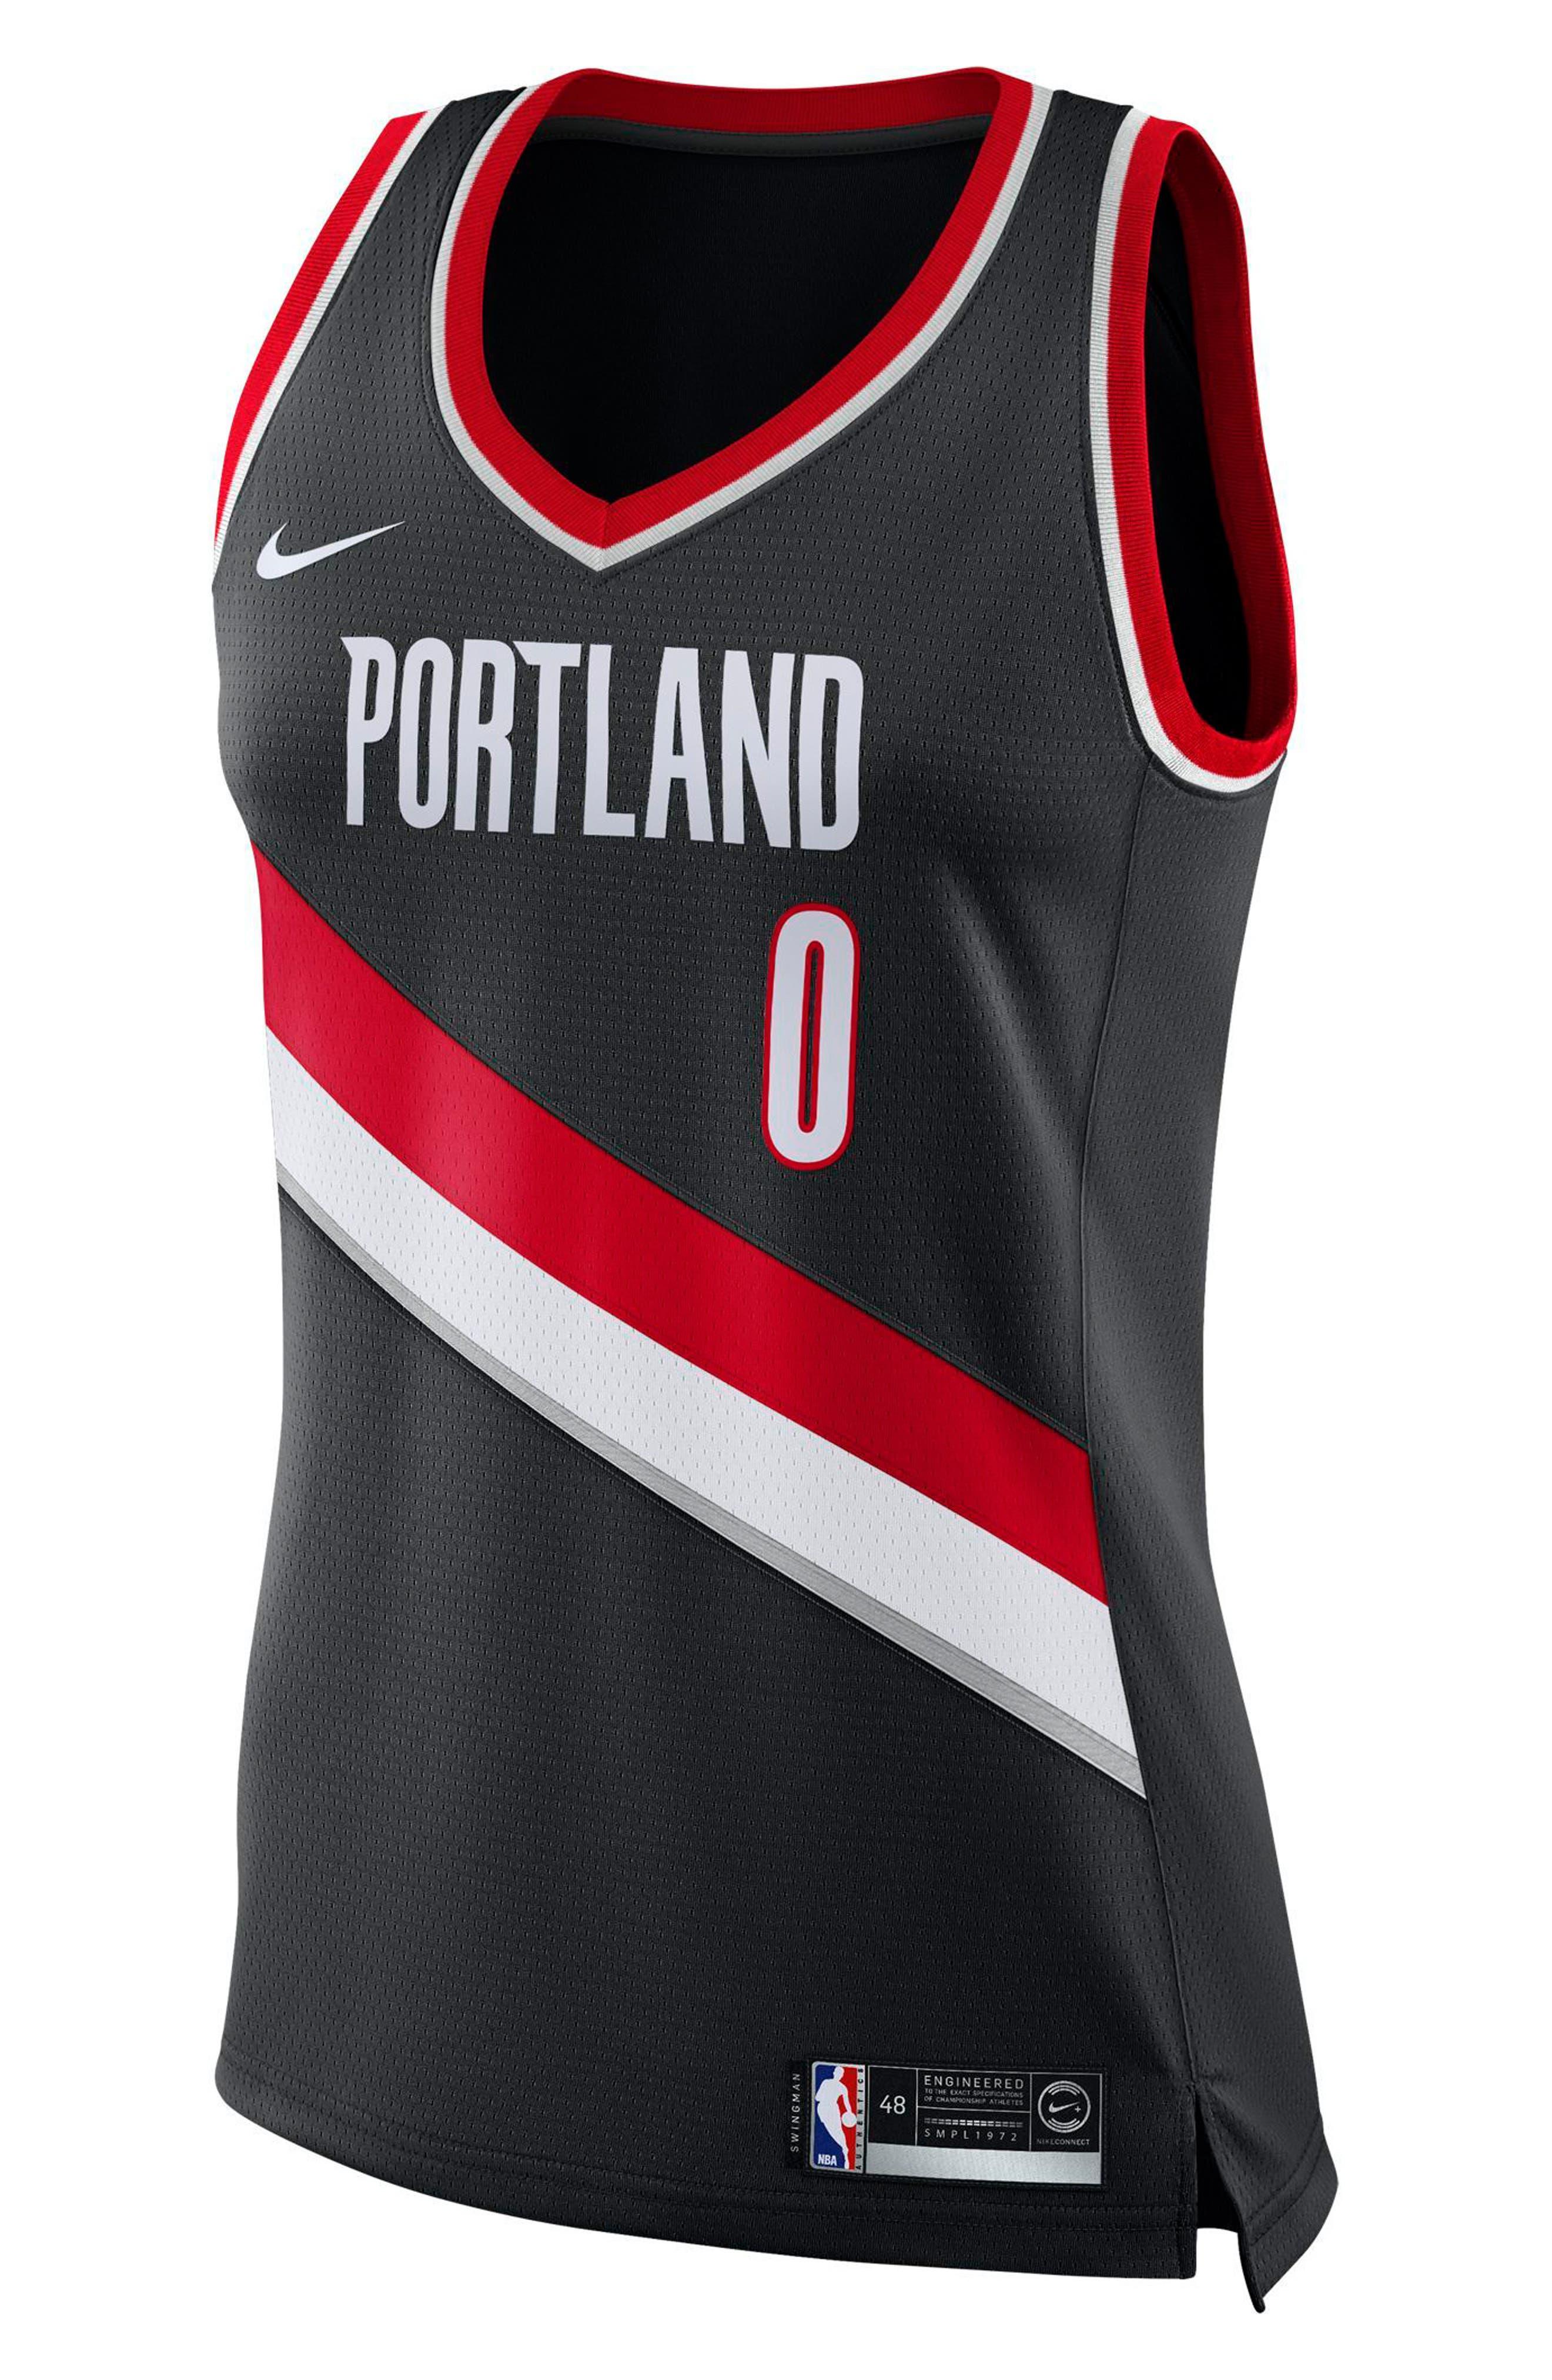 Portland Trail Blazers Icon Edition Swingman Women's NBA Jersey,                             Main thumbnail 1, color,                             010